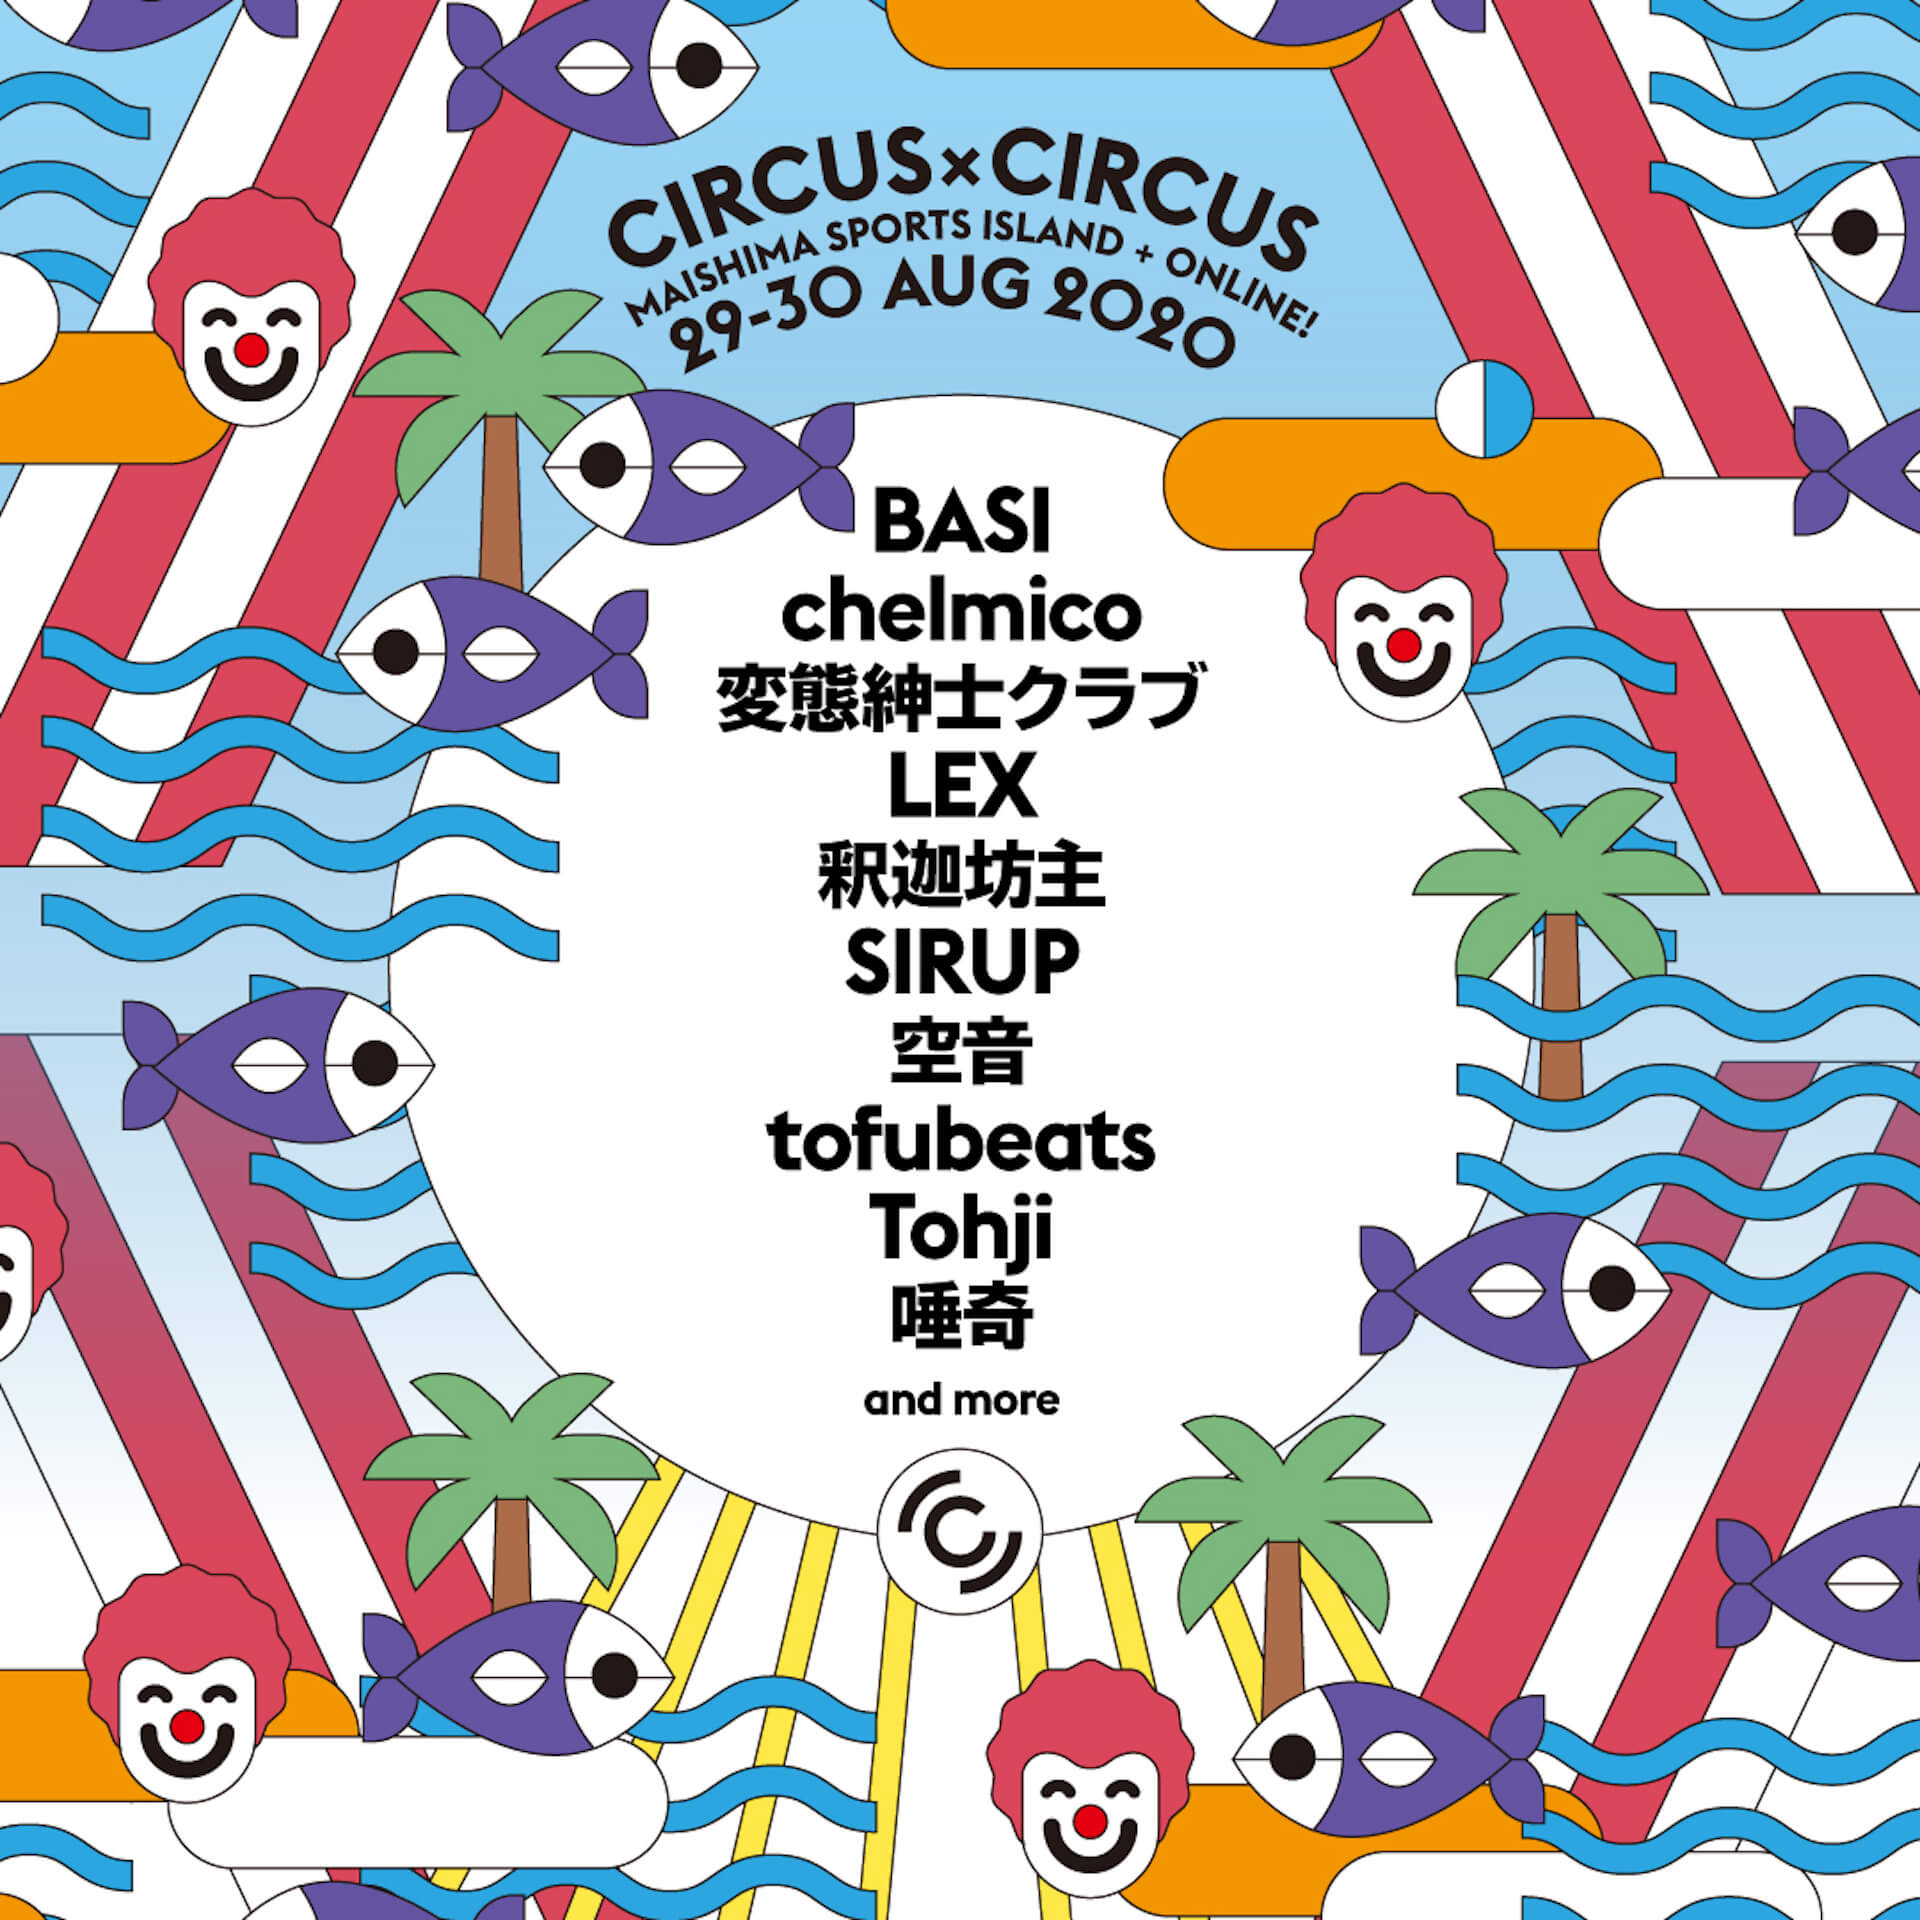 SIRUP、釈迦坊主、Tohji、tofubeats、chelmicoらが出演!<CIRCUS × CIRCUS>が8月に開催決定 music200610_circuscircus_2